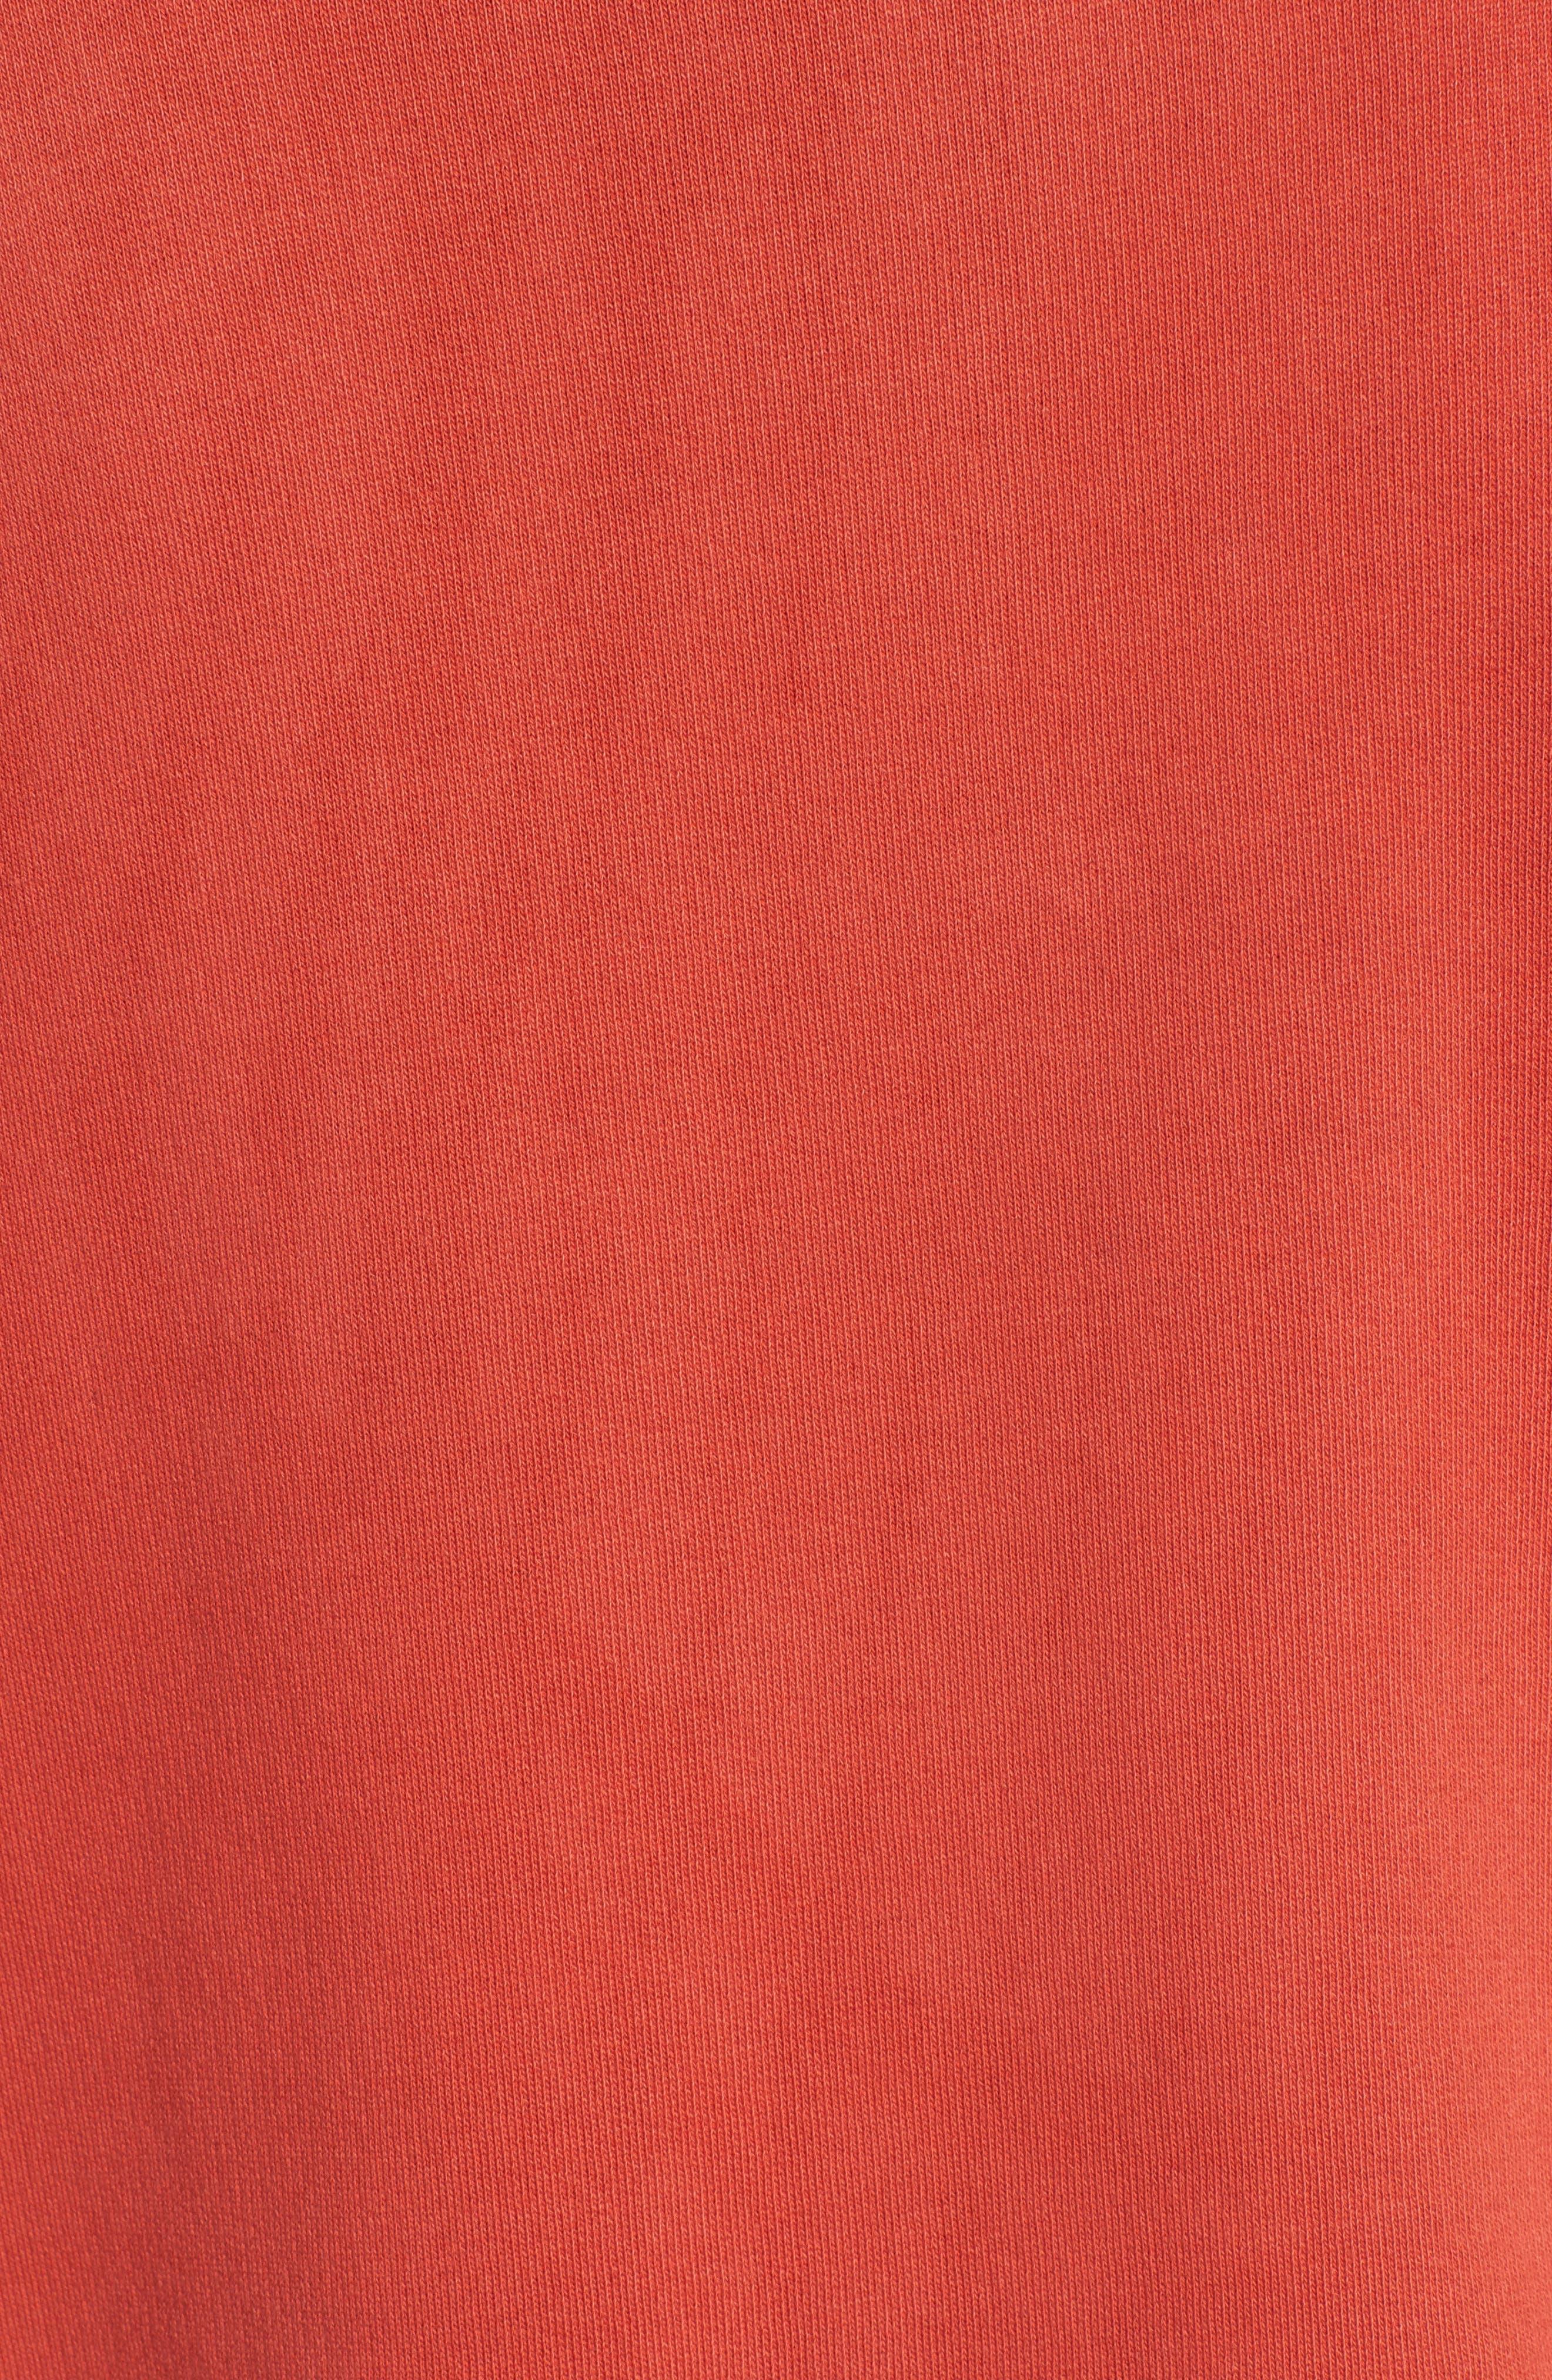 Alternate Image 4  - Sincerely Jules West Coast Sweatshirt